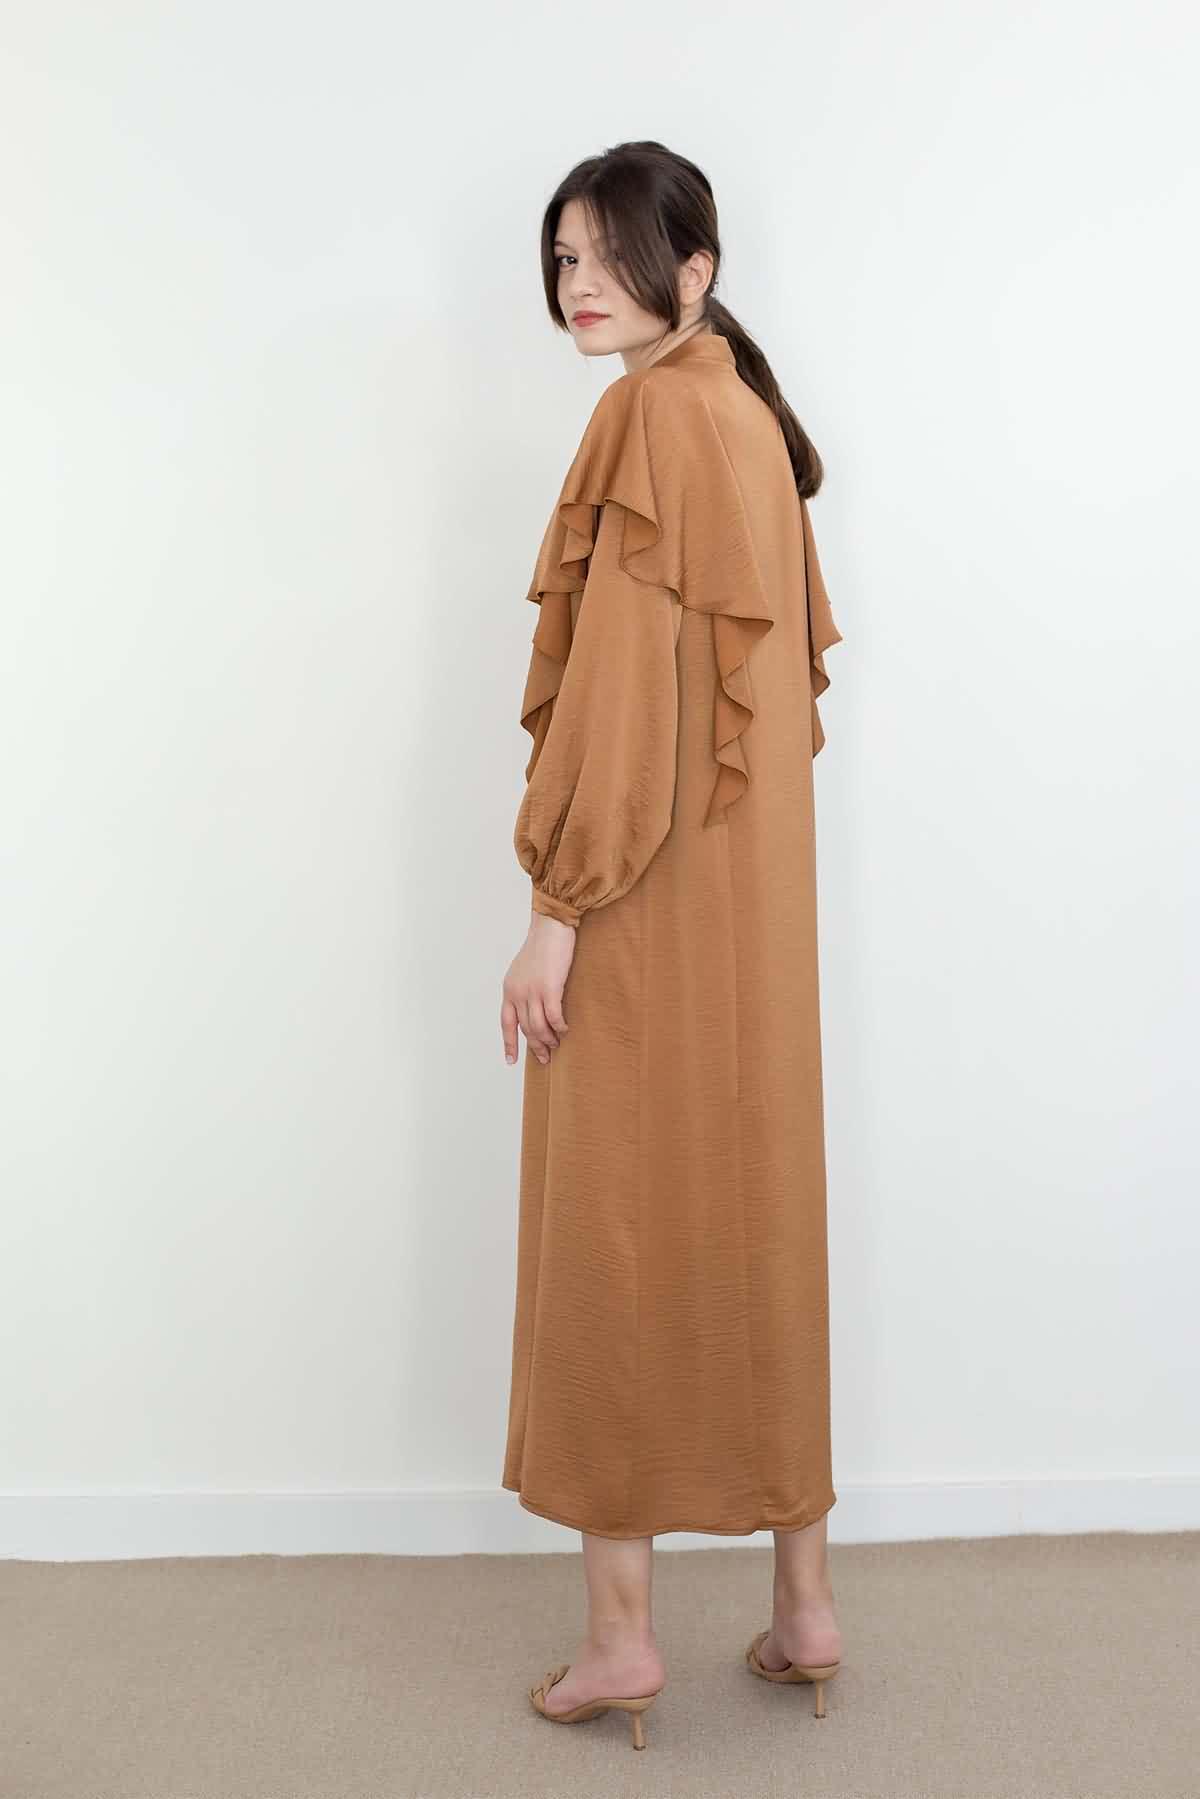 Mevra - Volanlı Elbise Toffee